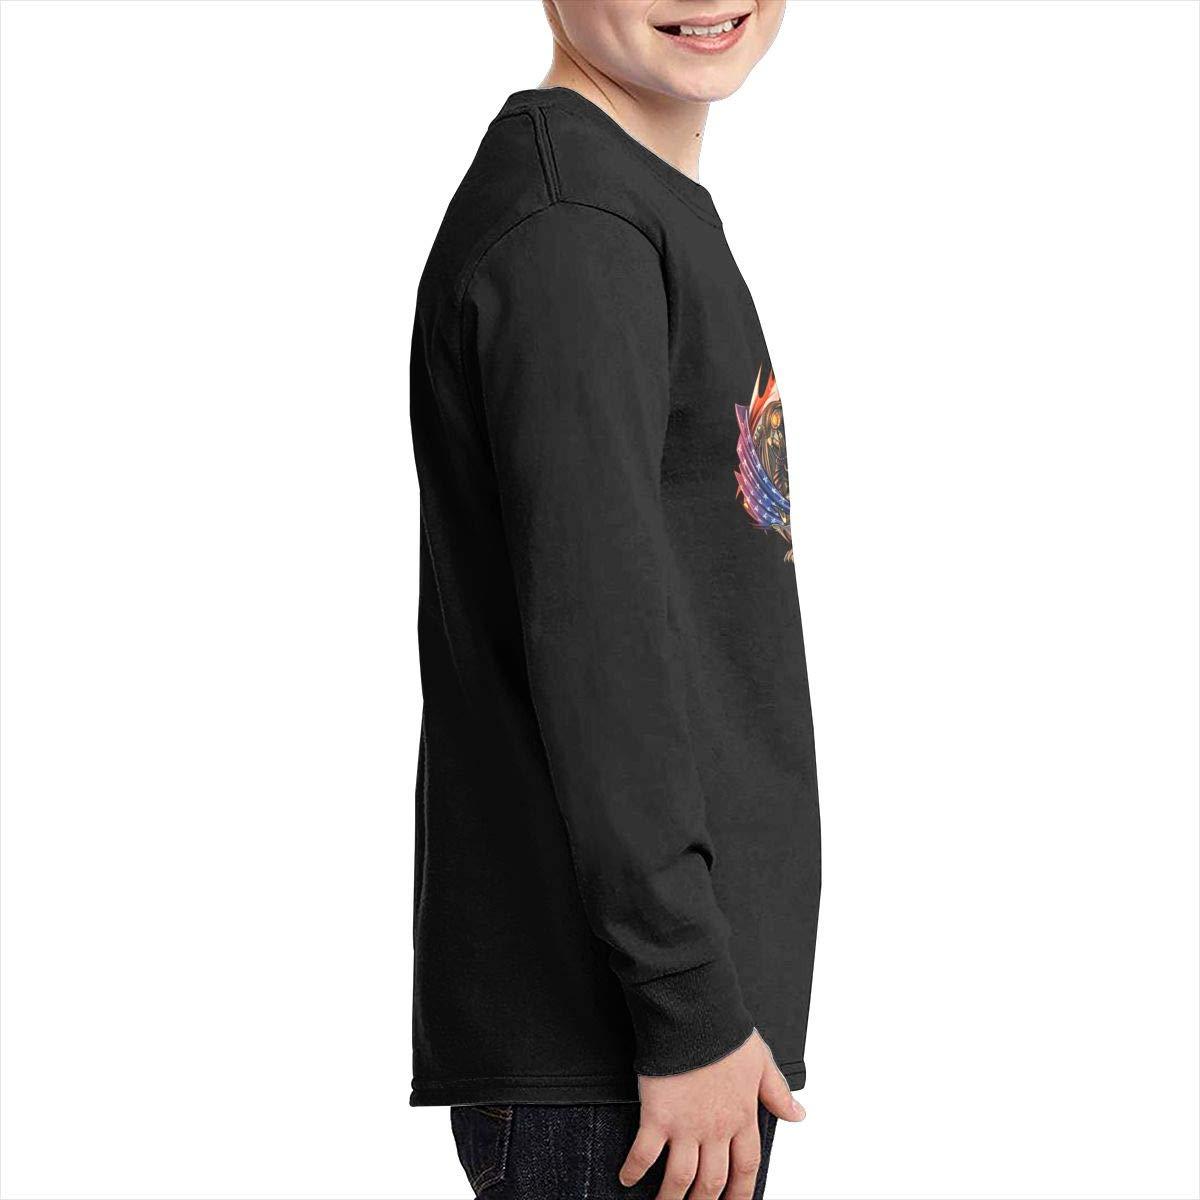 Bioshock Boys Fashion Classic Long Sleeve T-Shirt Boy Long Sleeve Cotton Round Neck T-Shirt